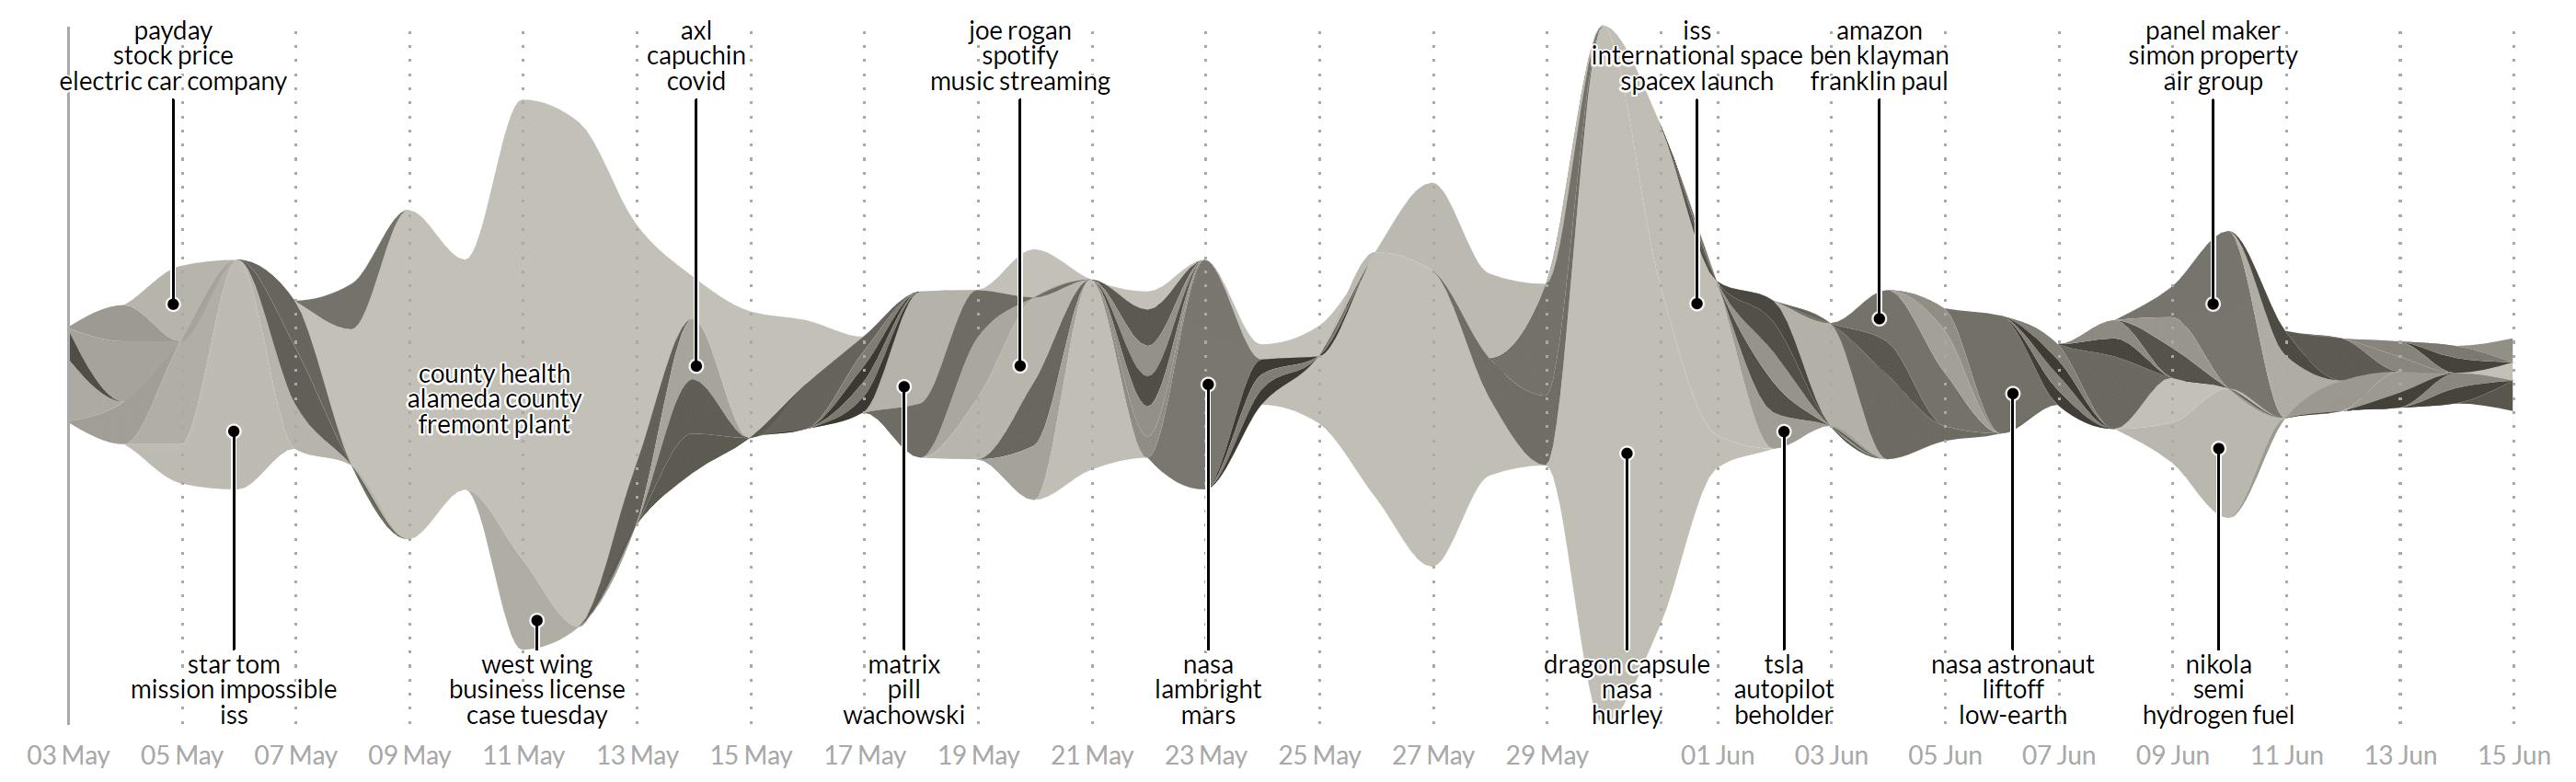 Story Graph Visualization - Tesla, May - June 2020